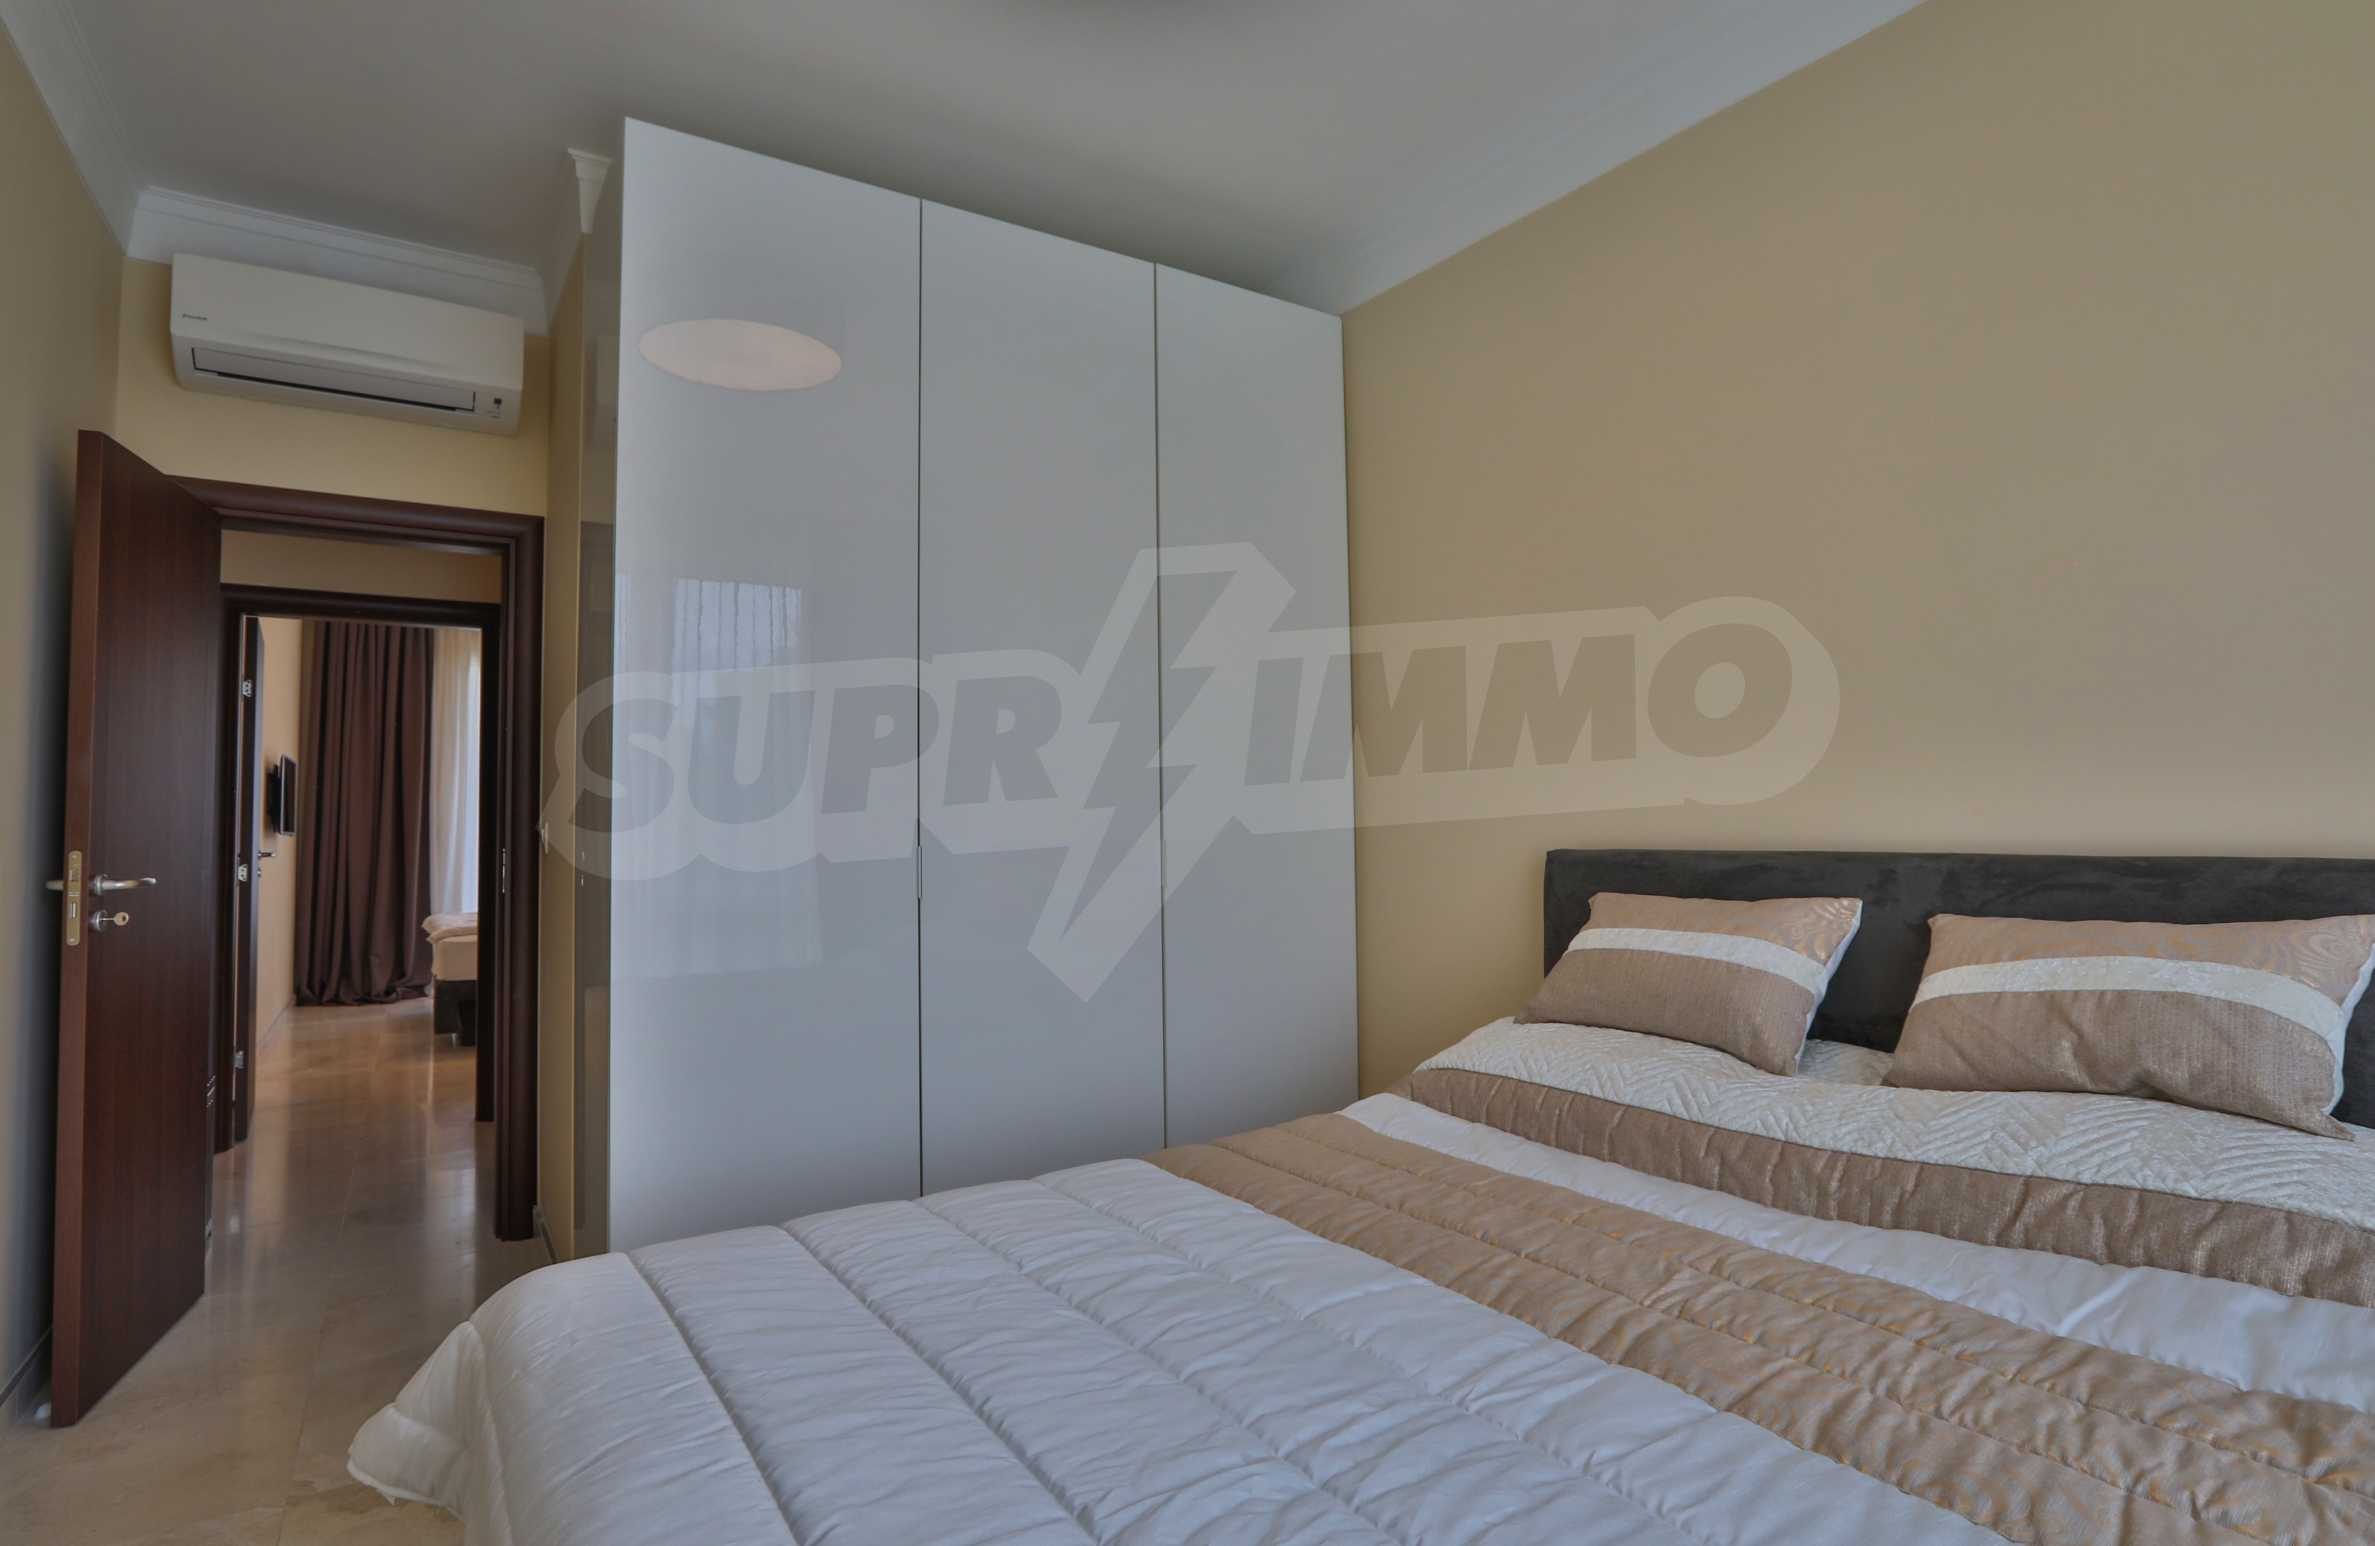 Exclusive 2-bedroom beachfront apartment in the prestigious Belle Époque Beach Residence 20